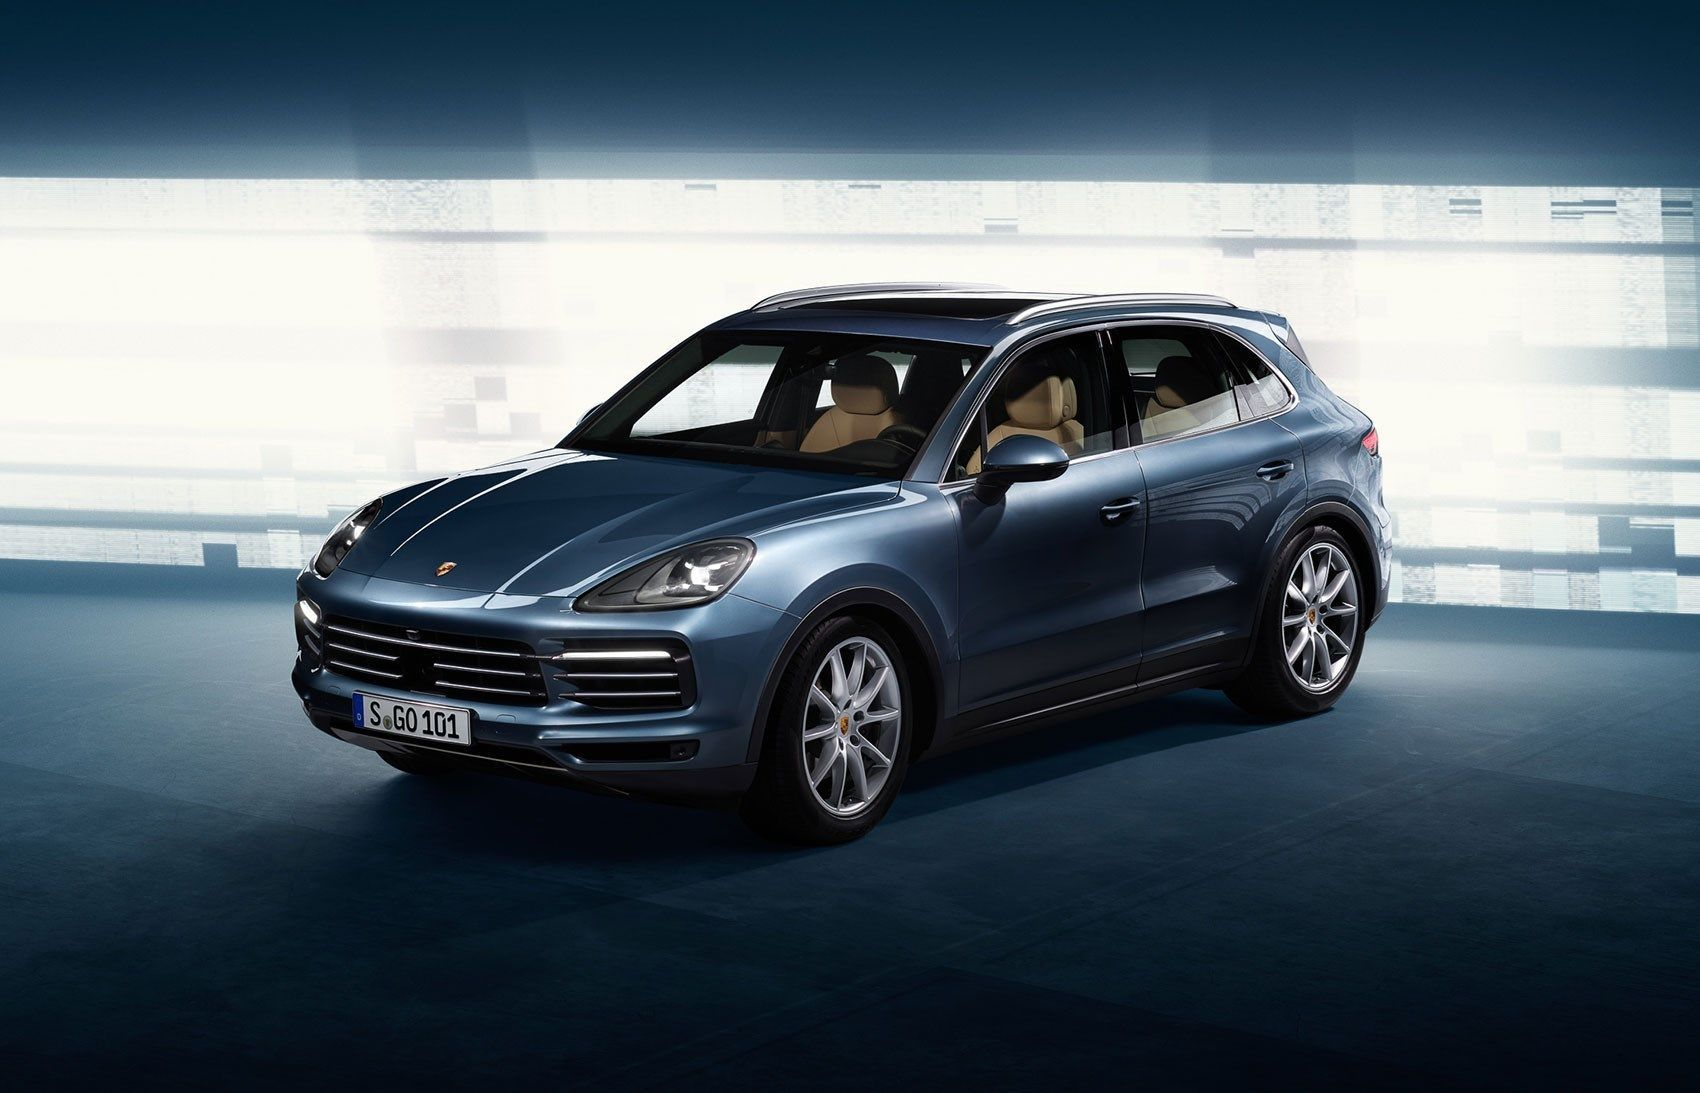 2018 Porsche Cayenne Price Review And Specs Porsche Cayenne New Porsche Porsche